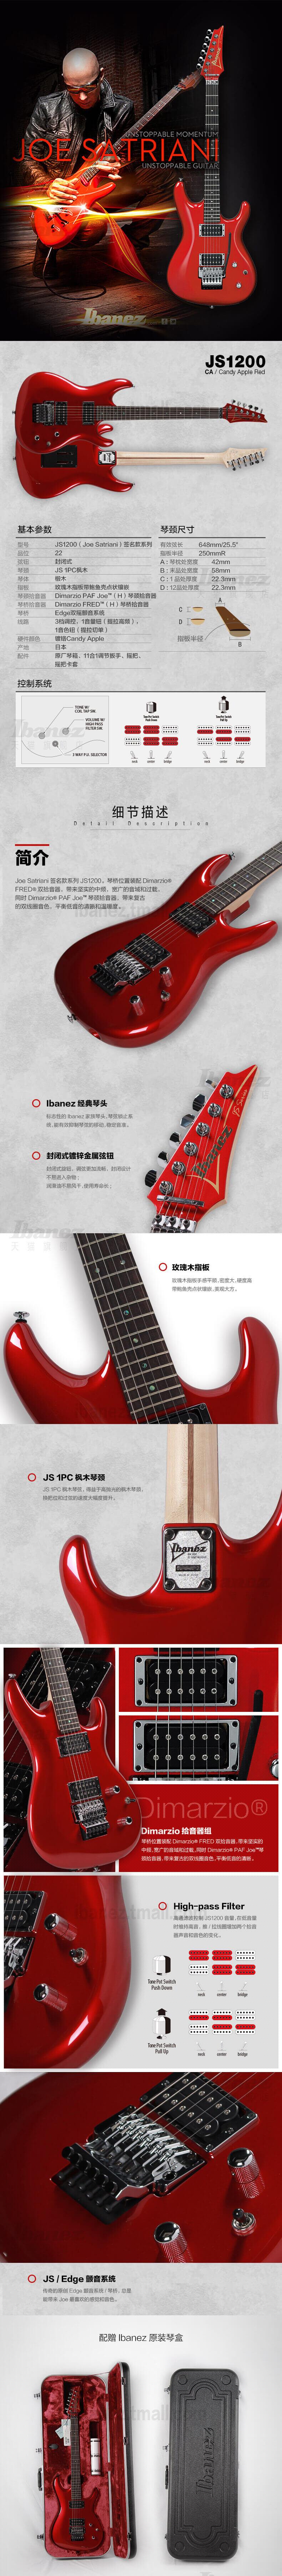 banez官方旗舰店 爱宾斯 依班娜JS1200电吉他Joe Satriani签名款 05